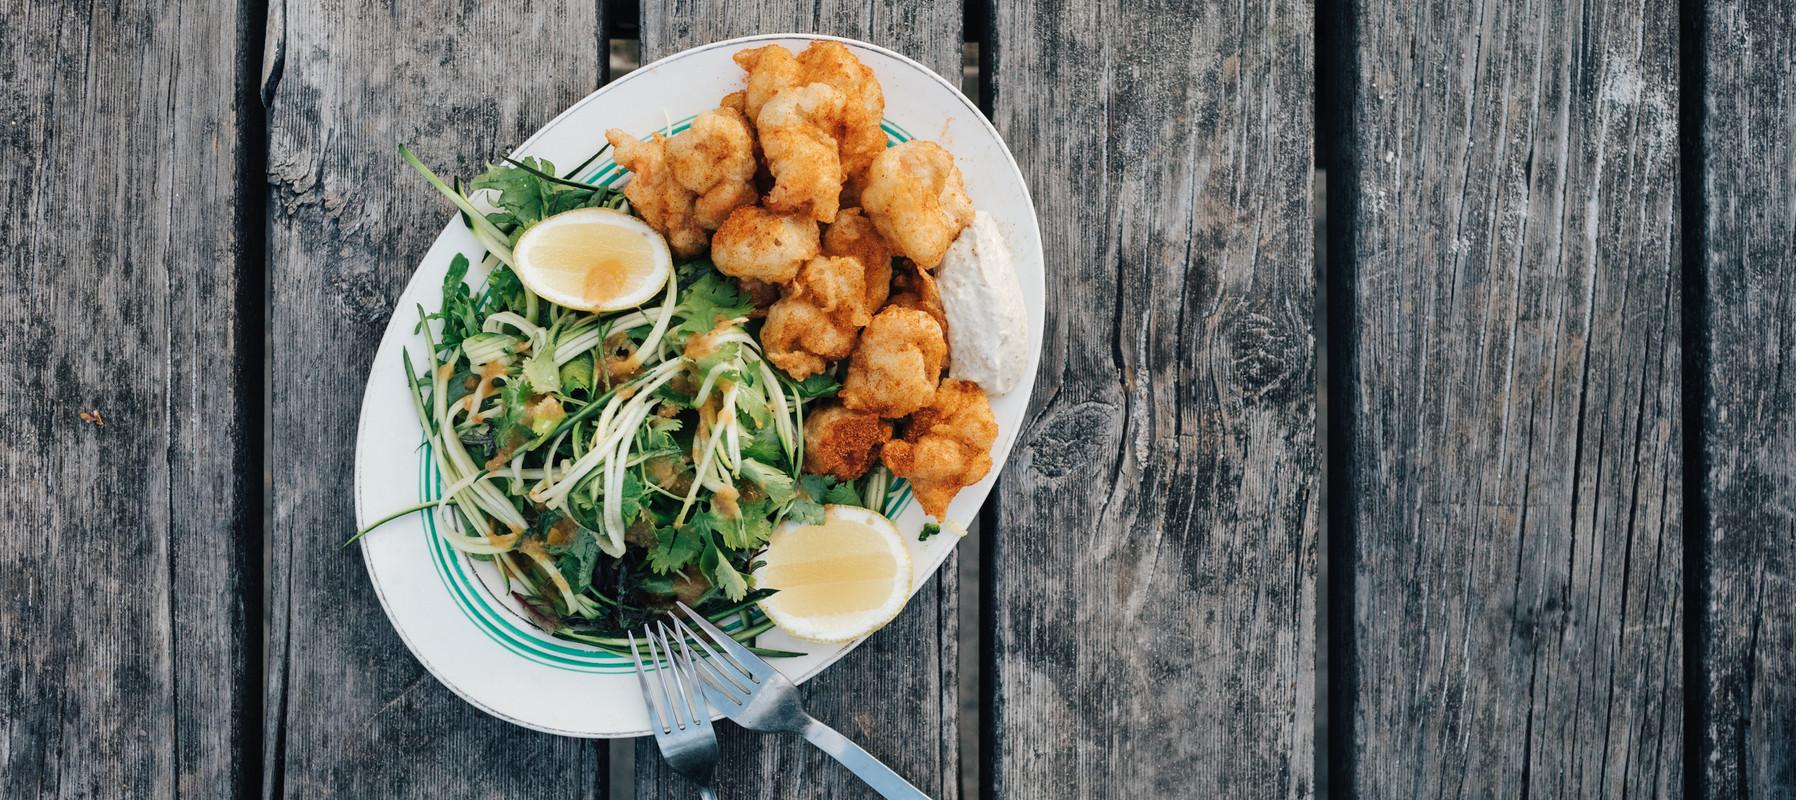 5753a20352c64da7edd8b8f5652e50b7c9912f99_recipe-food-old-bay-fried-scallop-salad-final-complete.jpg